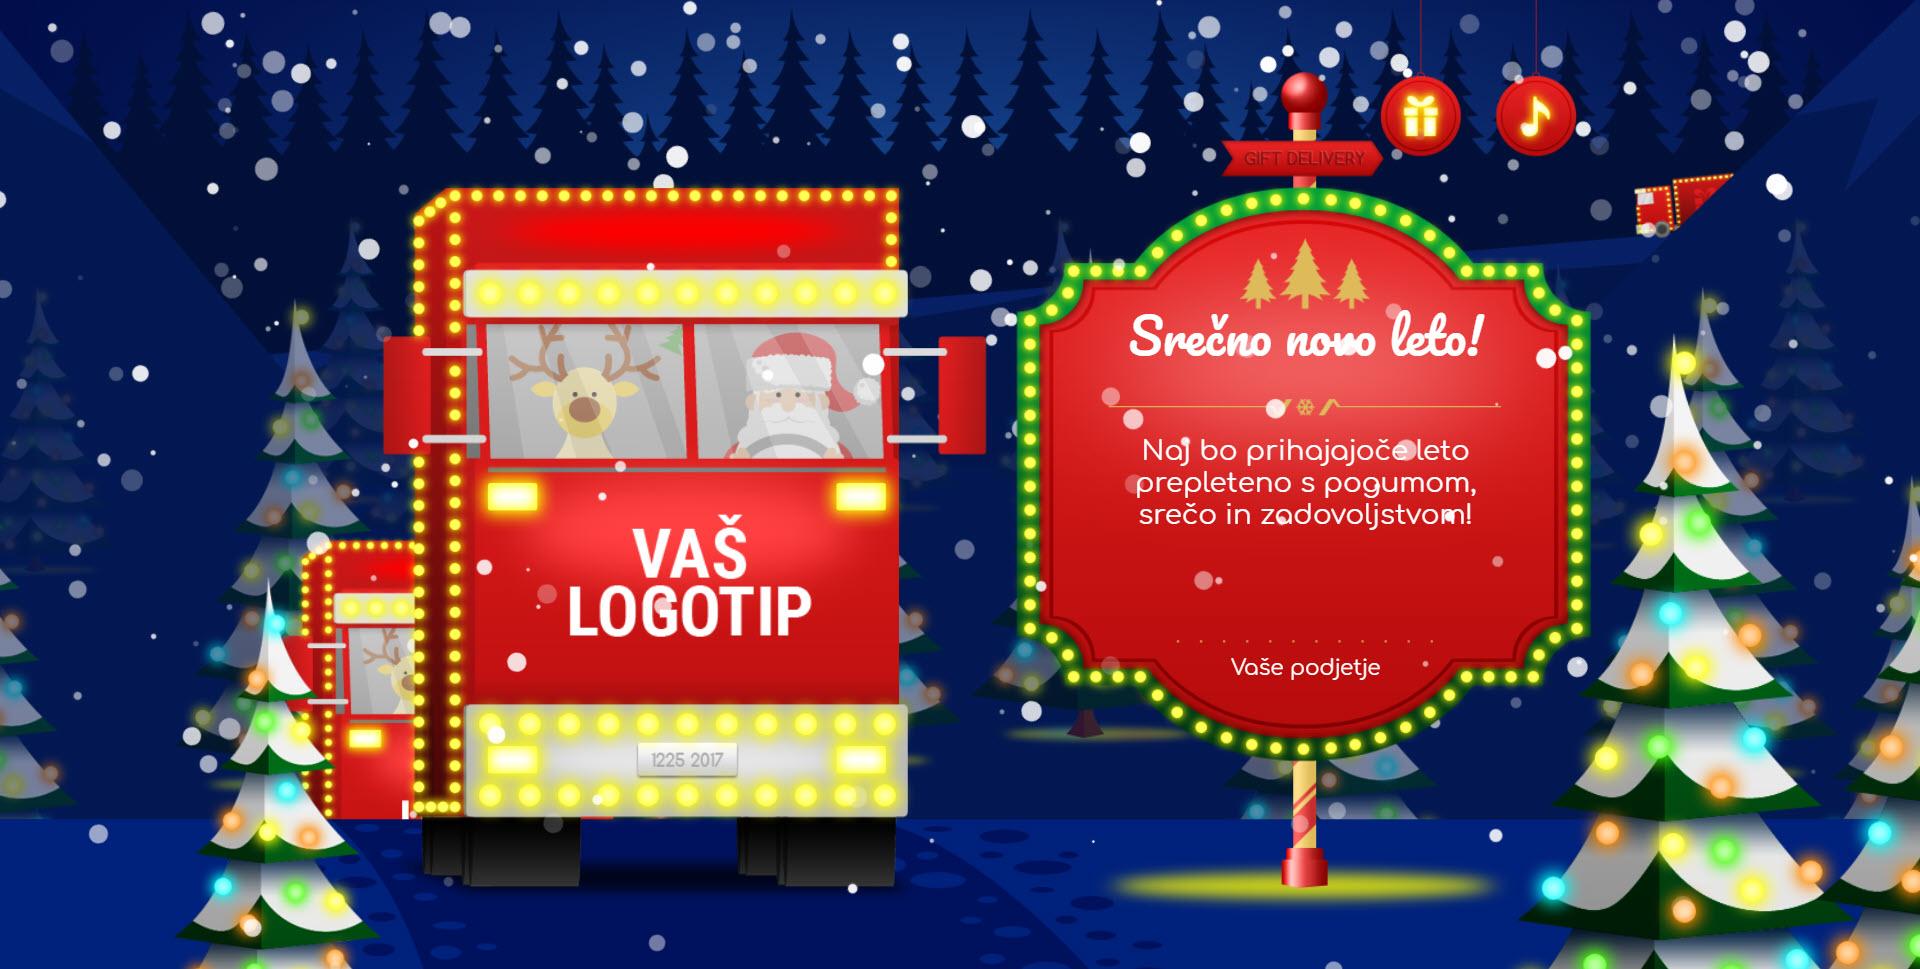 christmas card delivery of gifts version colorful - Naročilo voščilnice